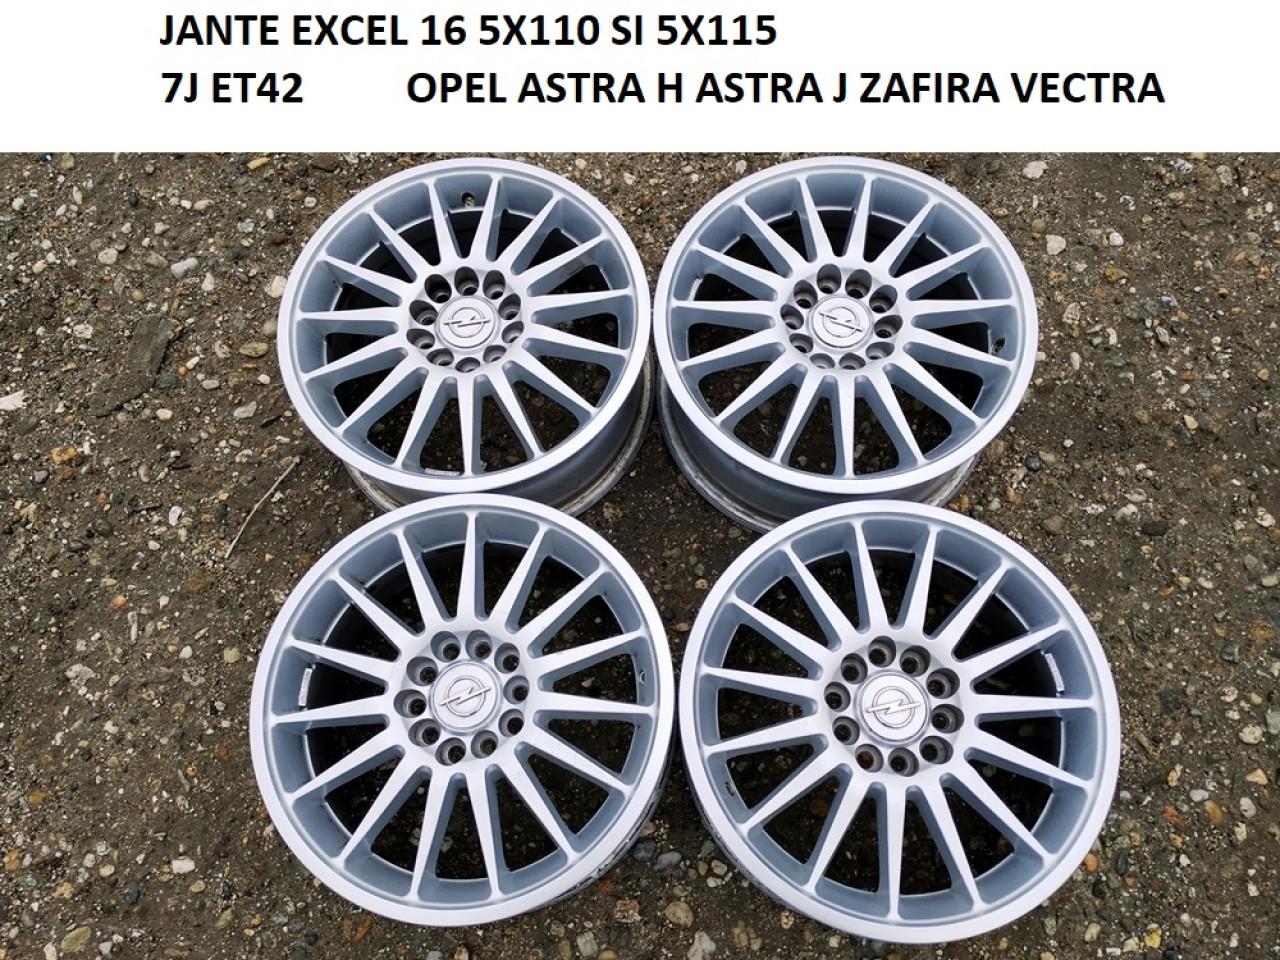 JANTE OPEL 5X115 SI 5X110 EXCEL